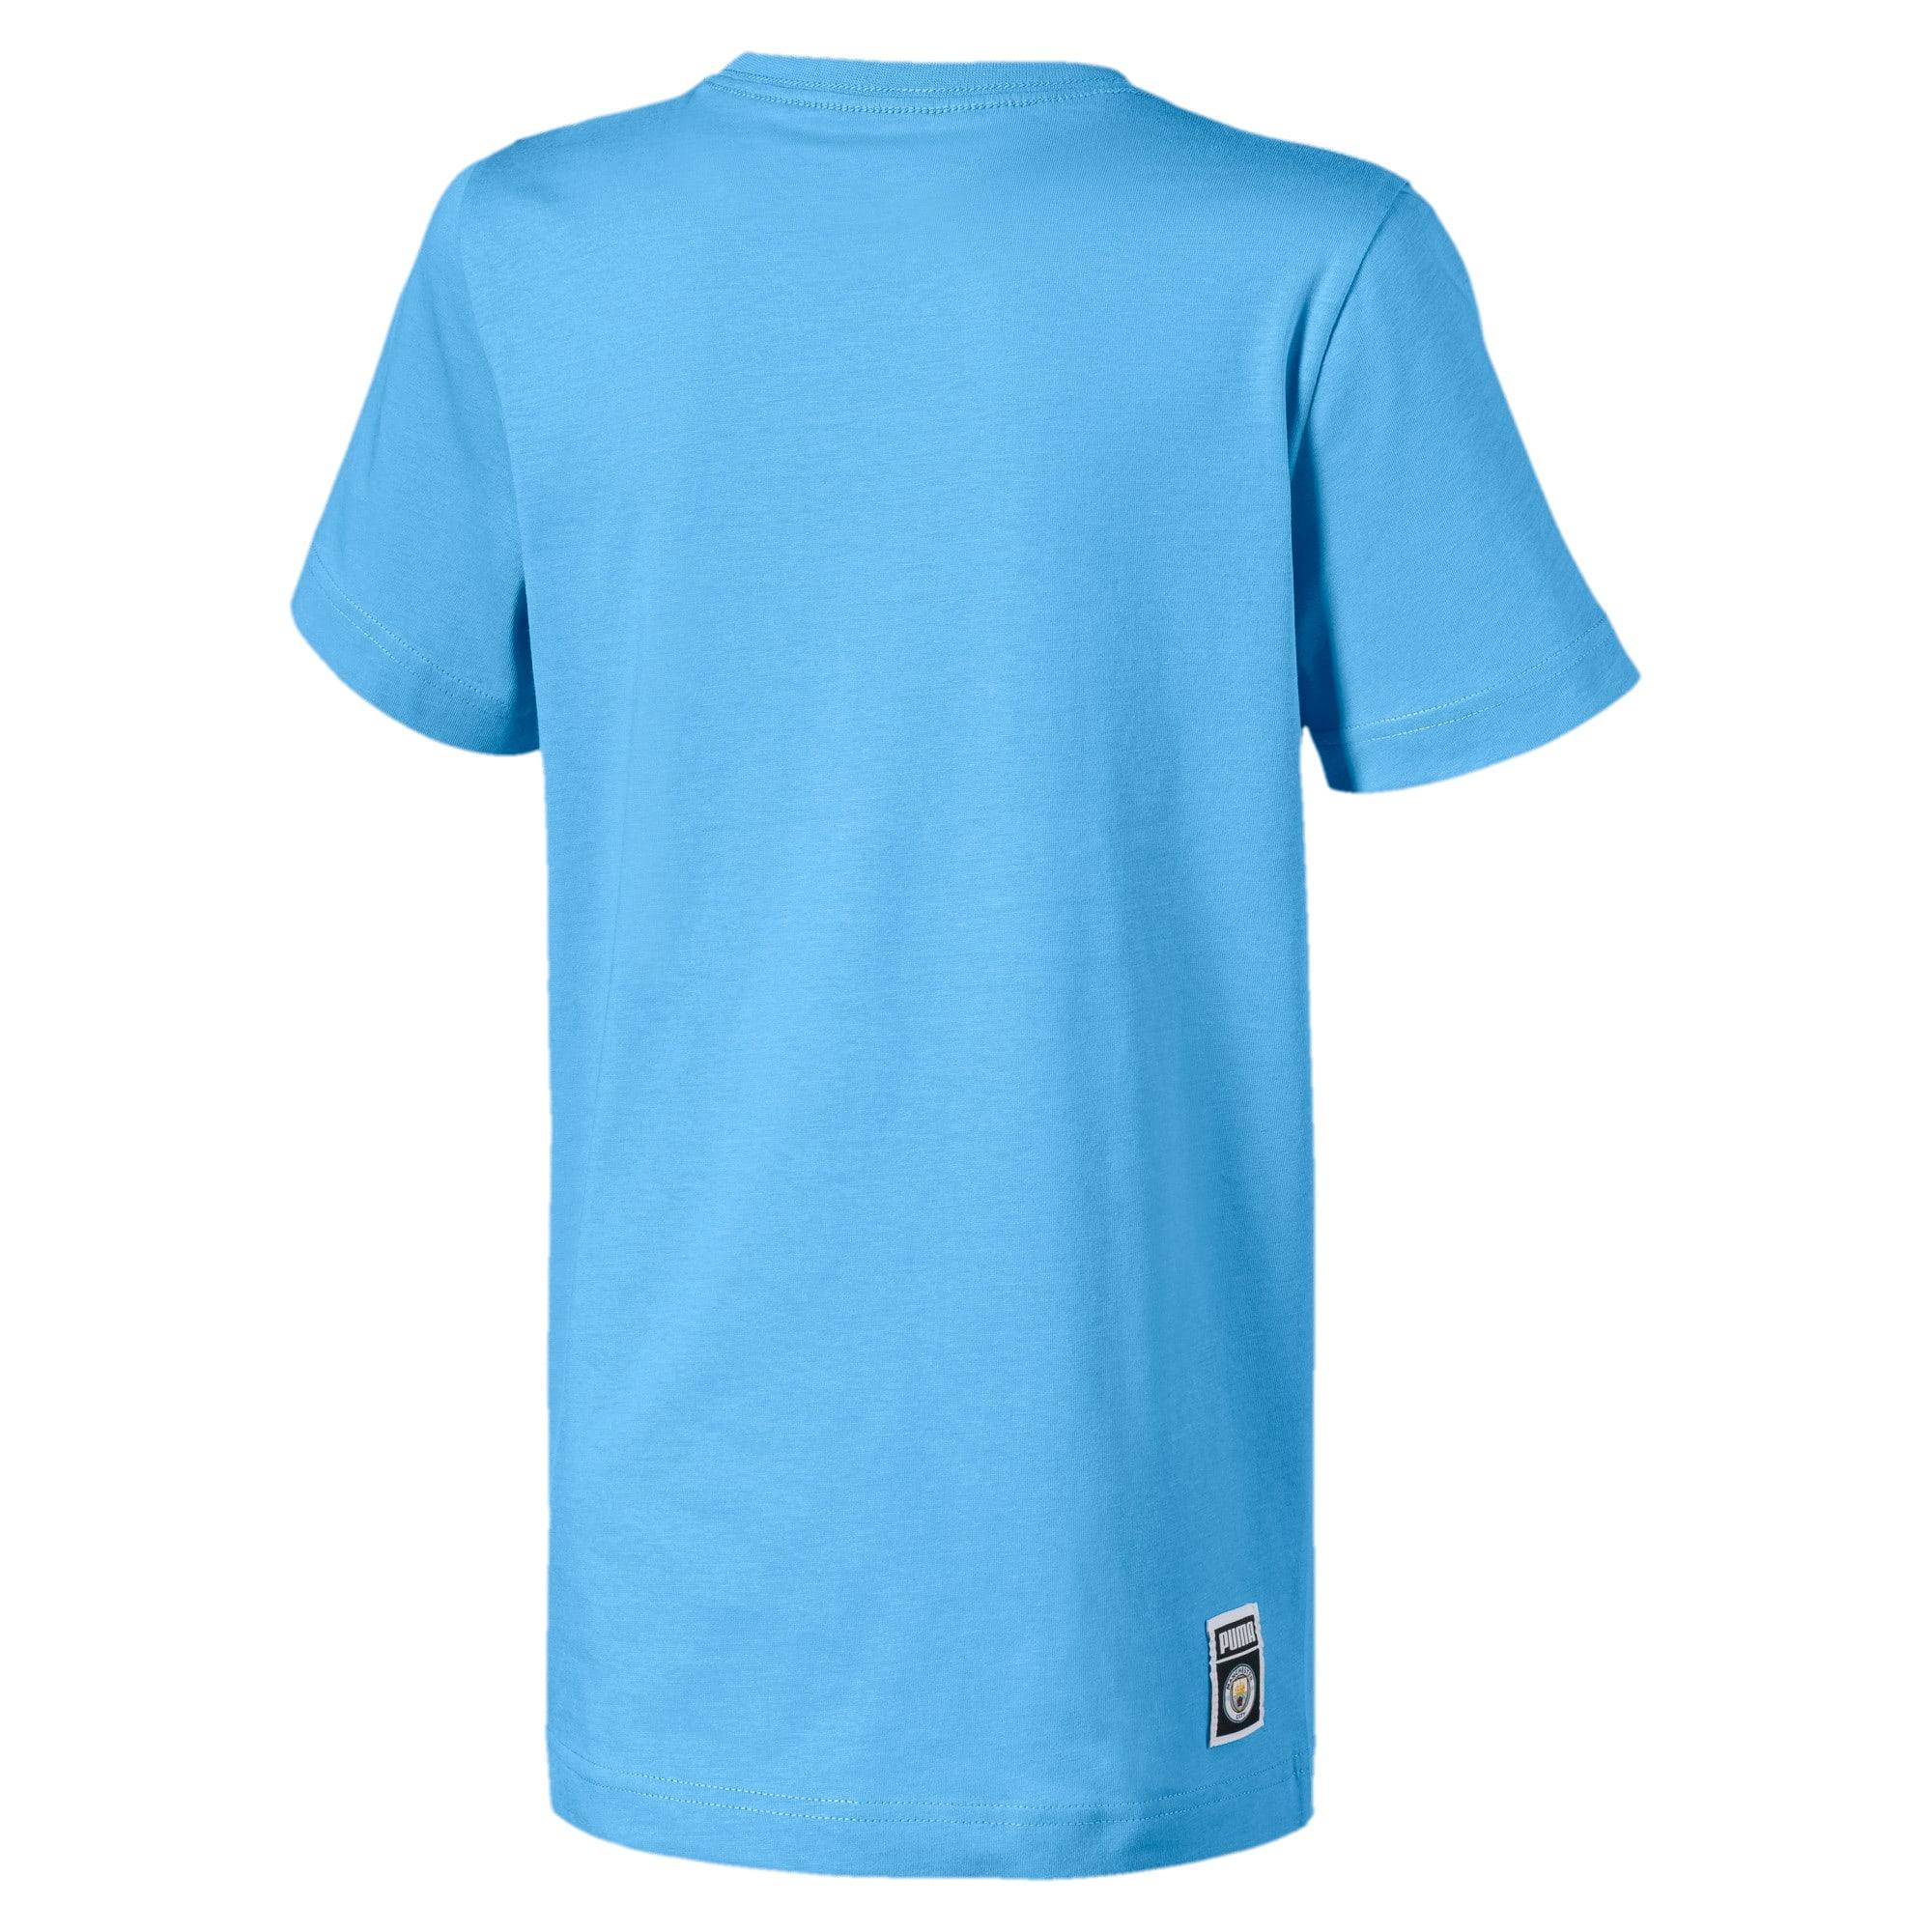 Imagen en miniatura 2 de Camiseta con etiqueta de zapatillas de niño Man City, Team Light Blue-puma white, mediana